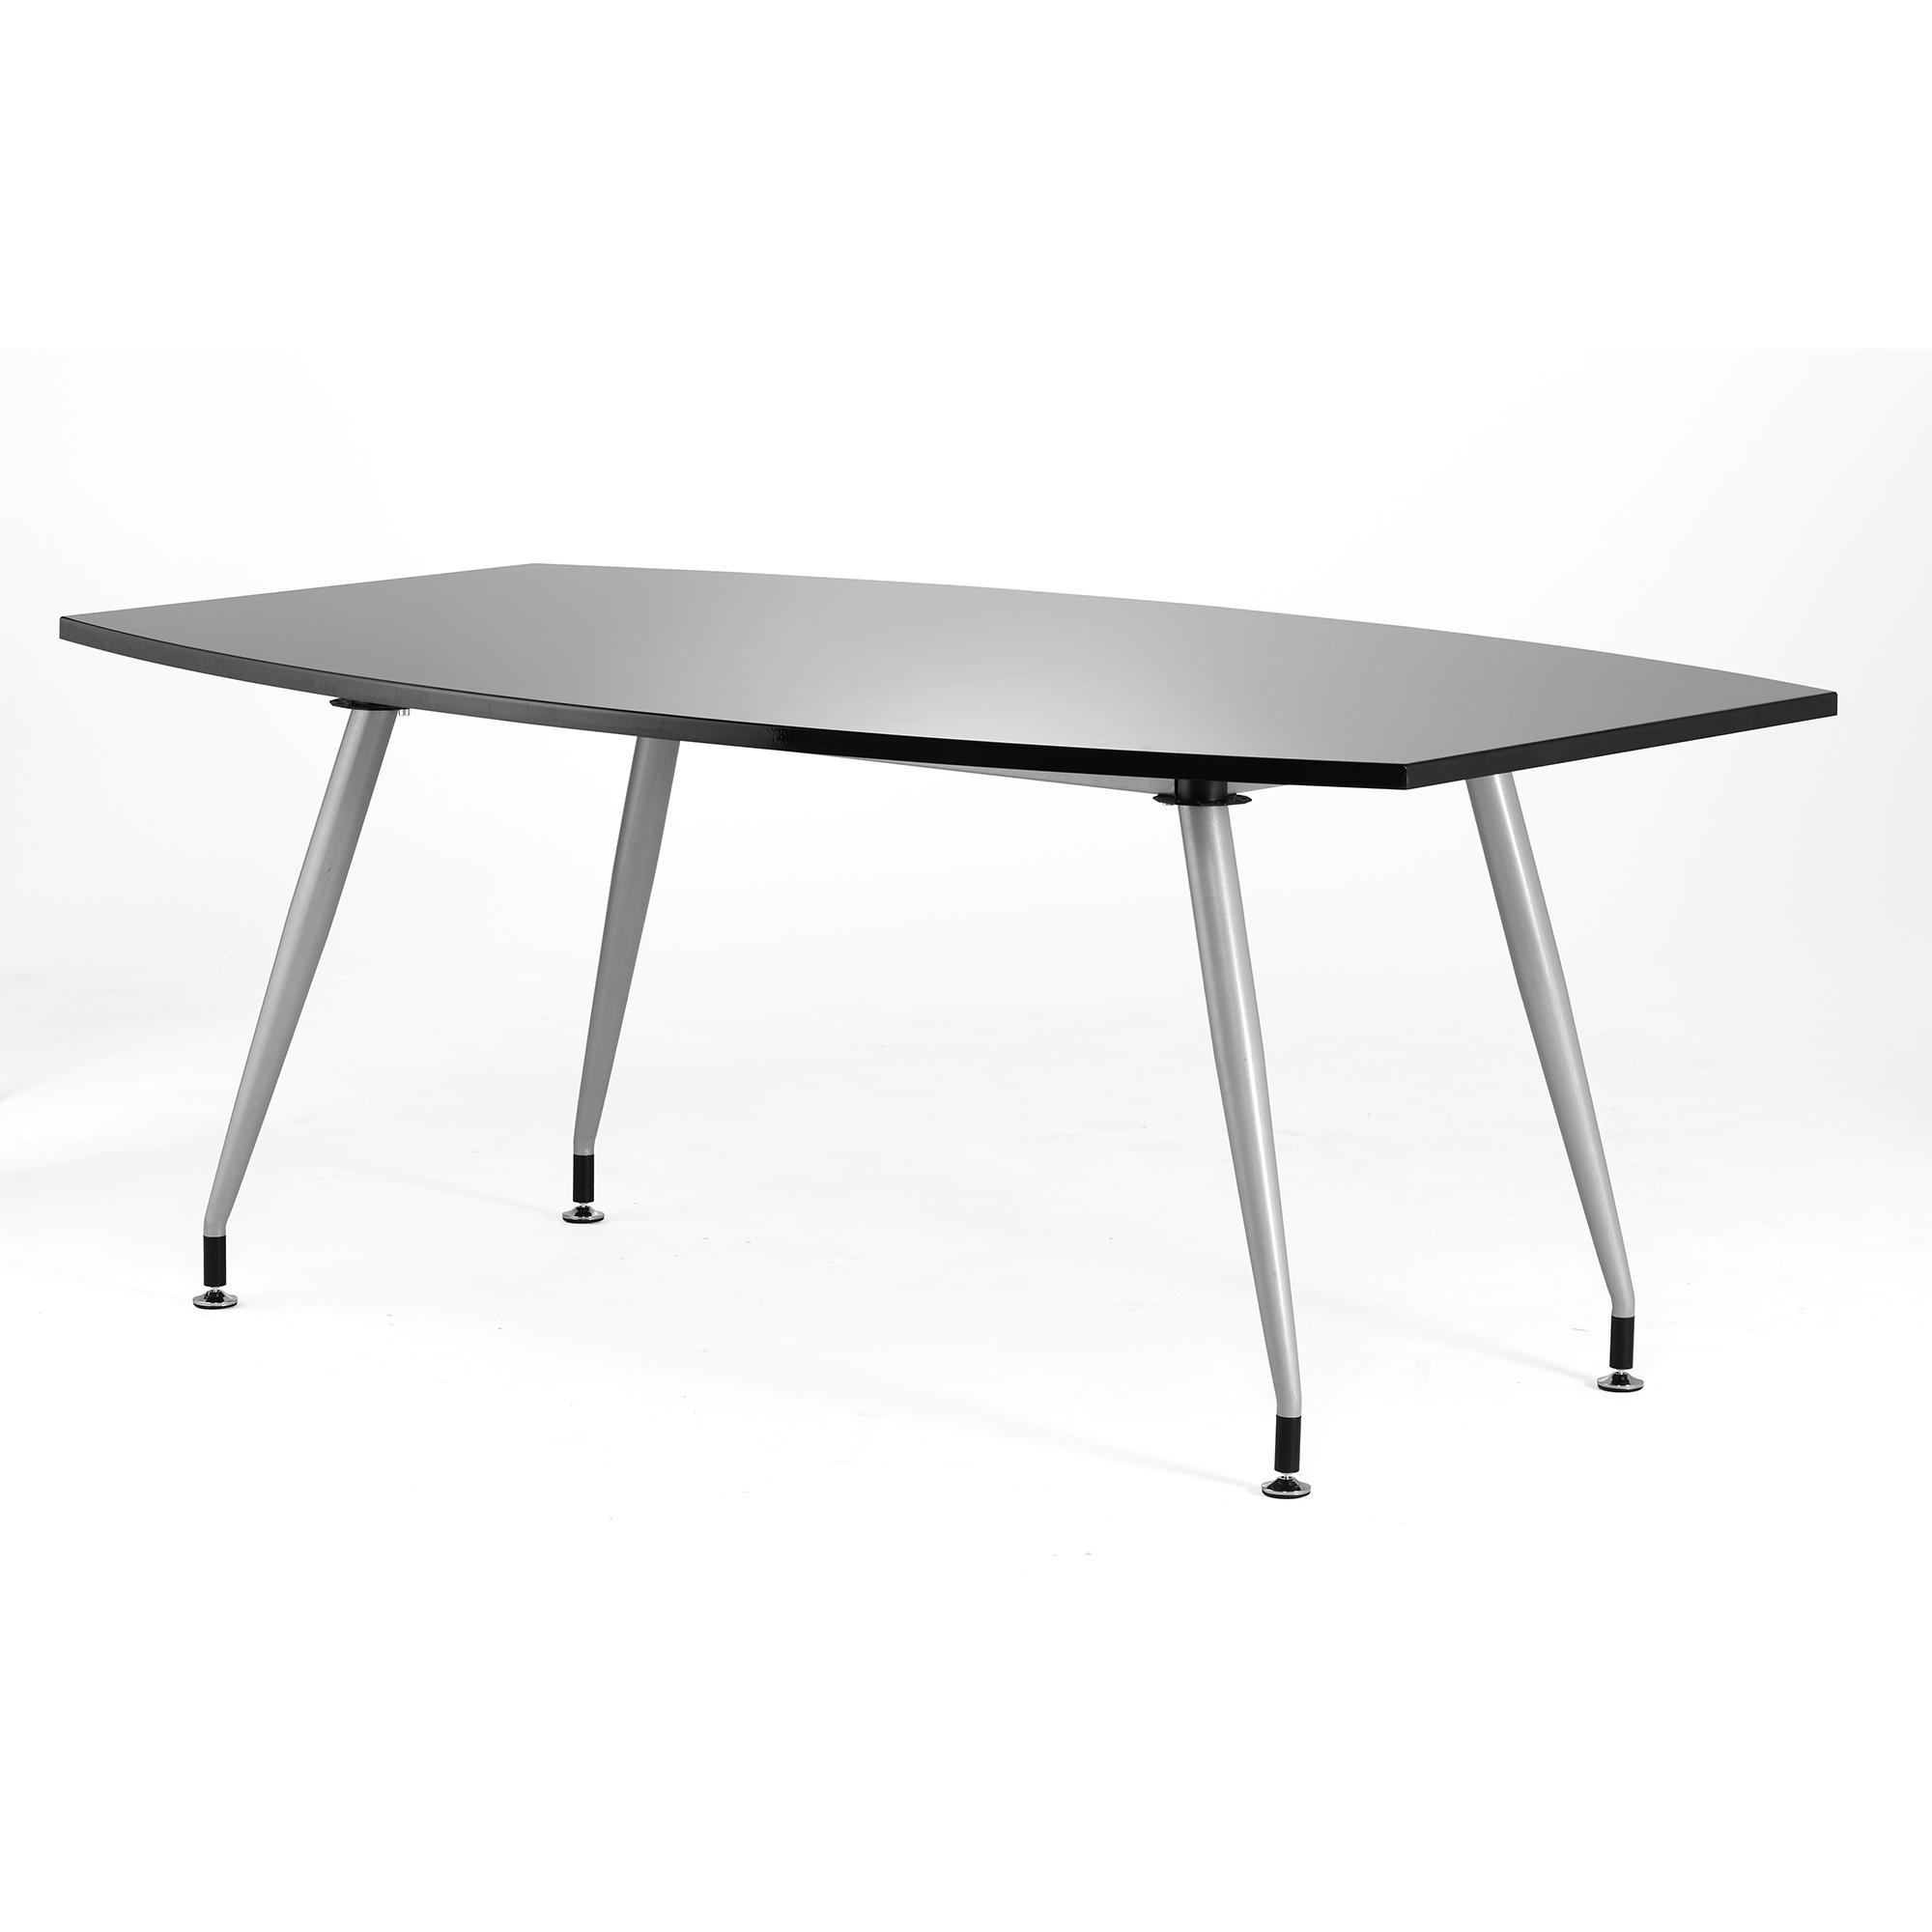 Sonix 1800x1200x800mm Boardroom Table High Gloss Black Ref I000731